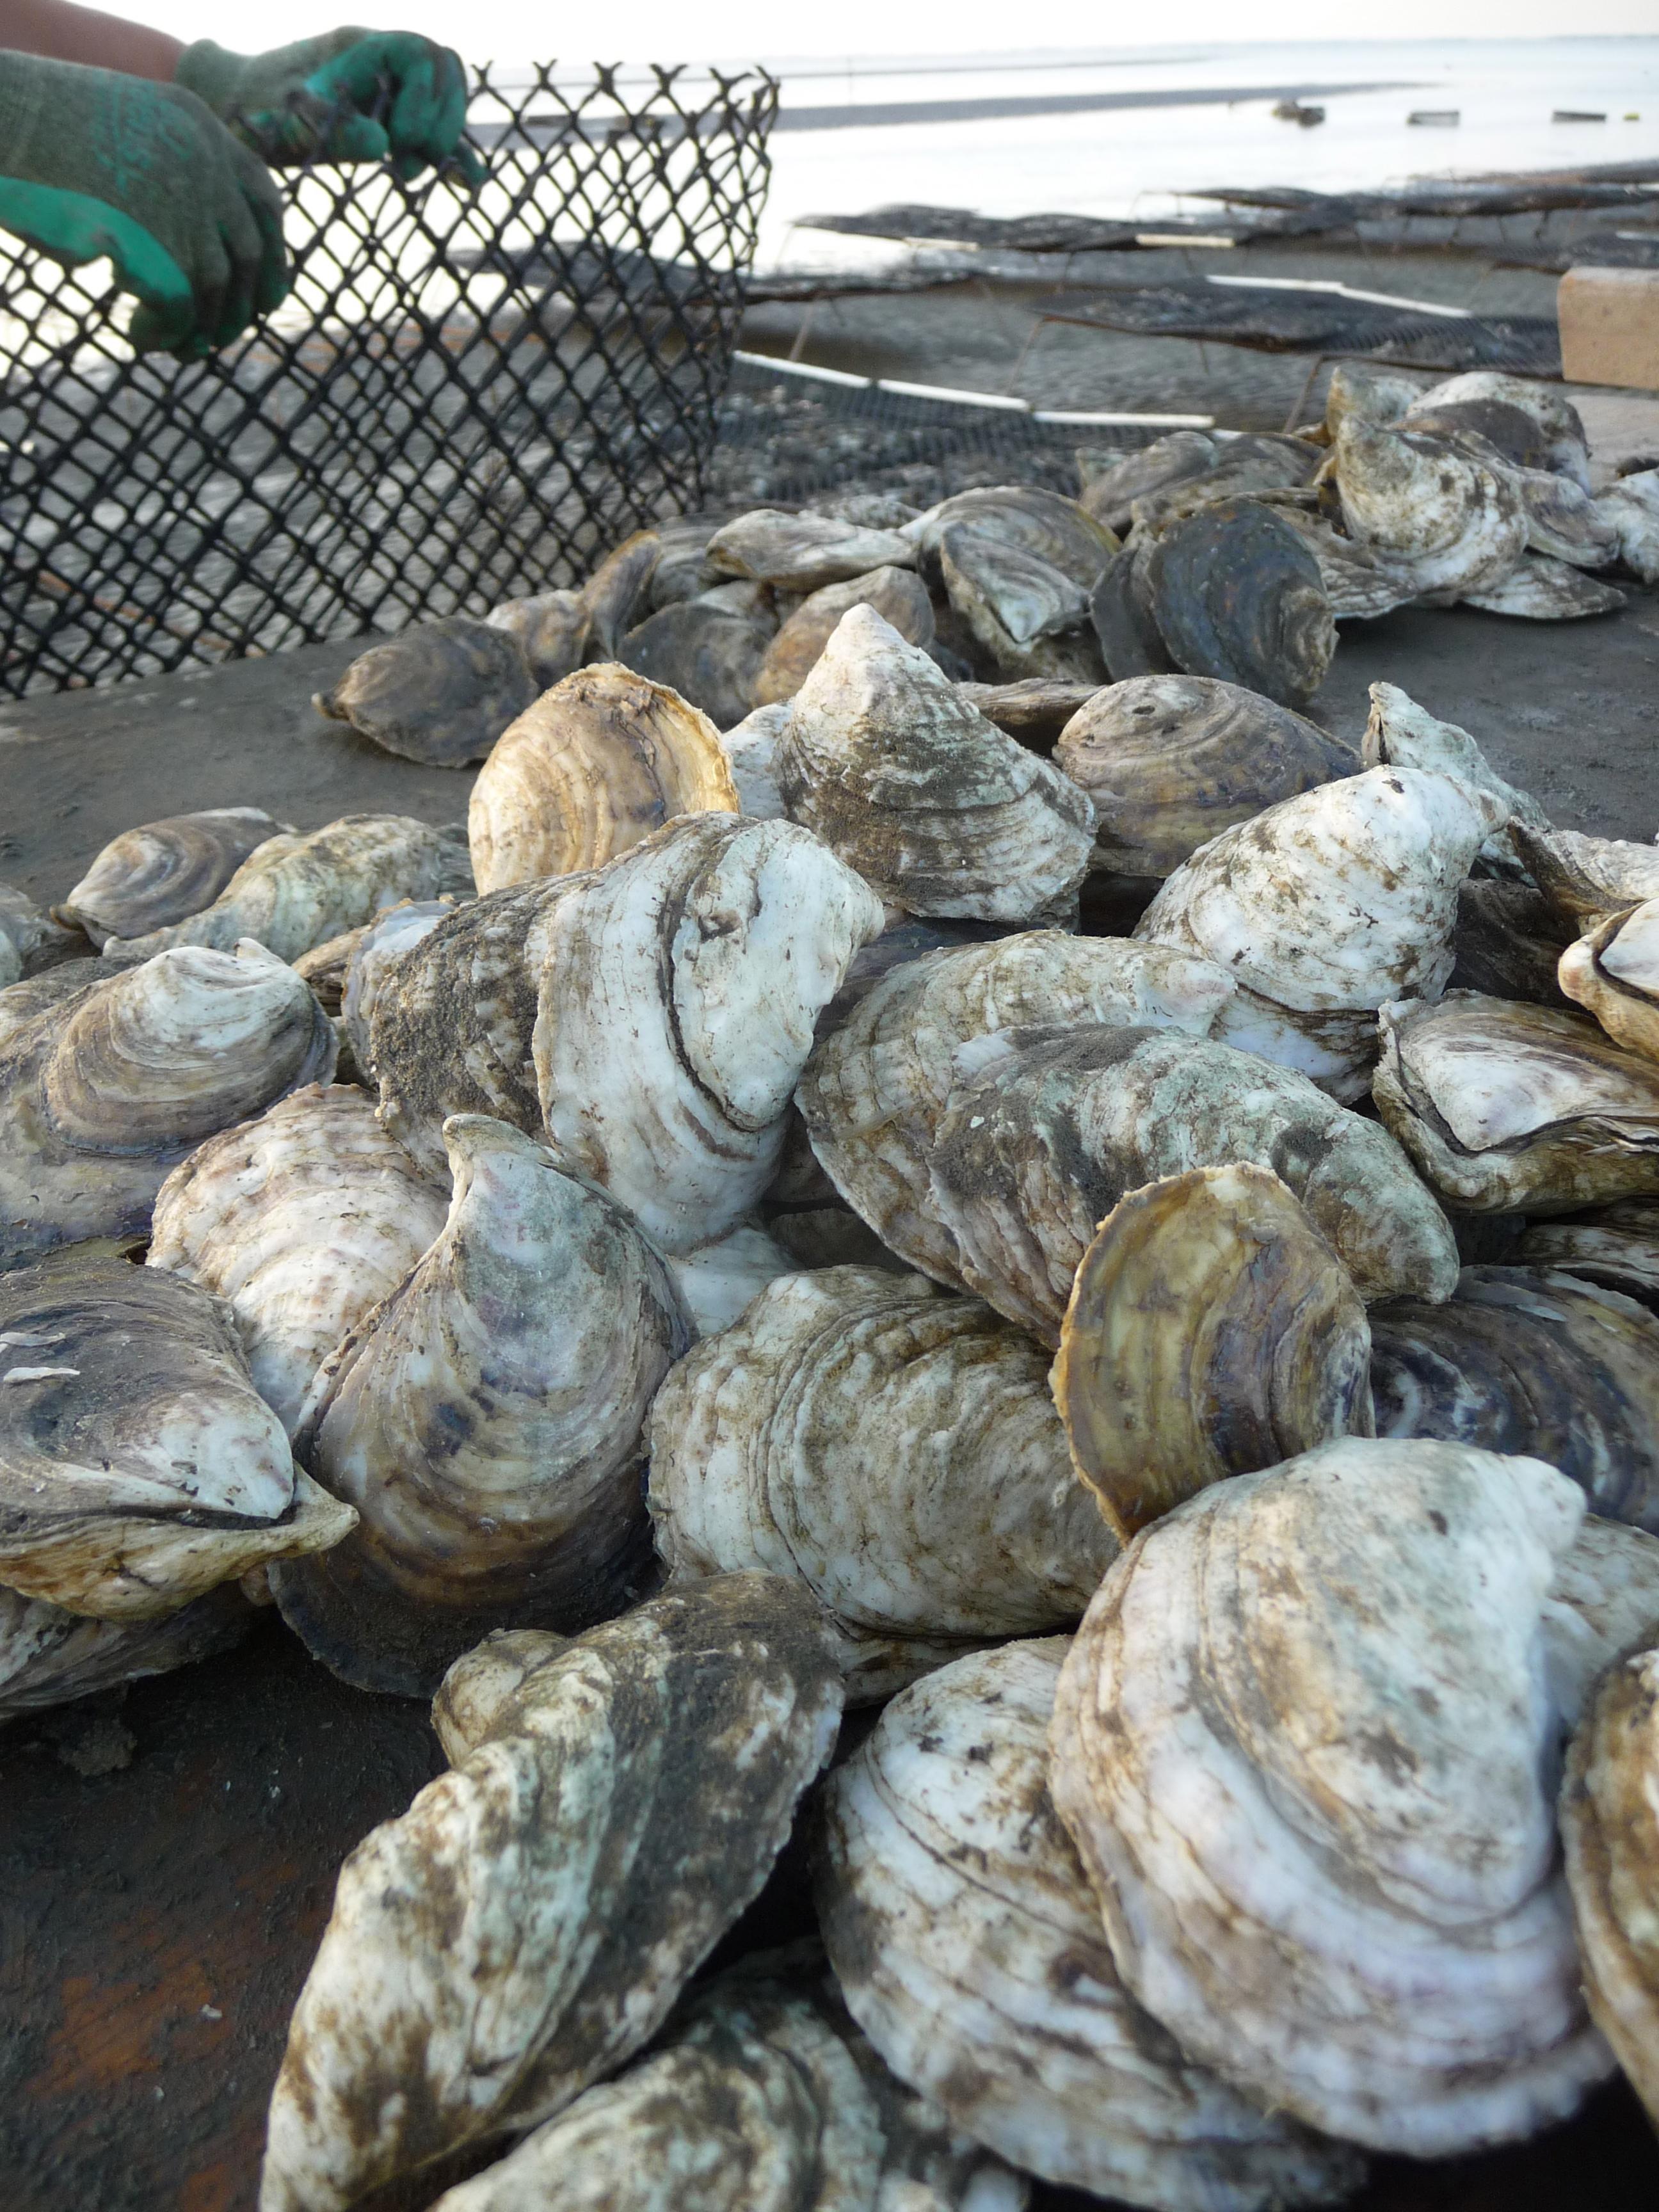 'Triploid' Oyster, Shellfish